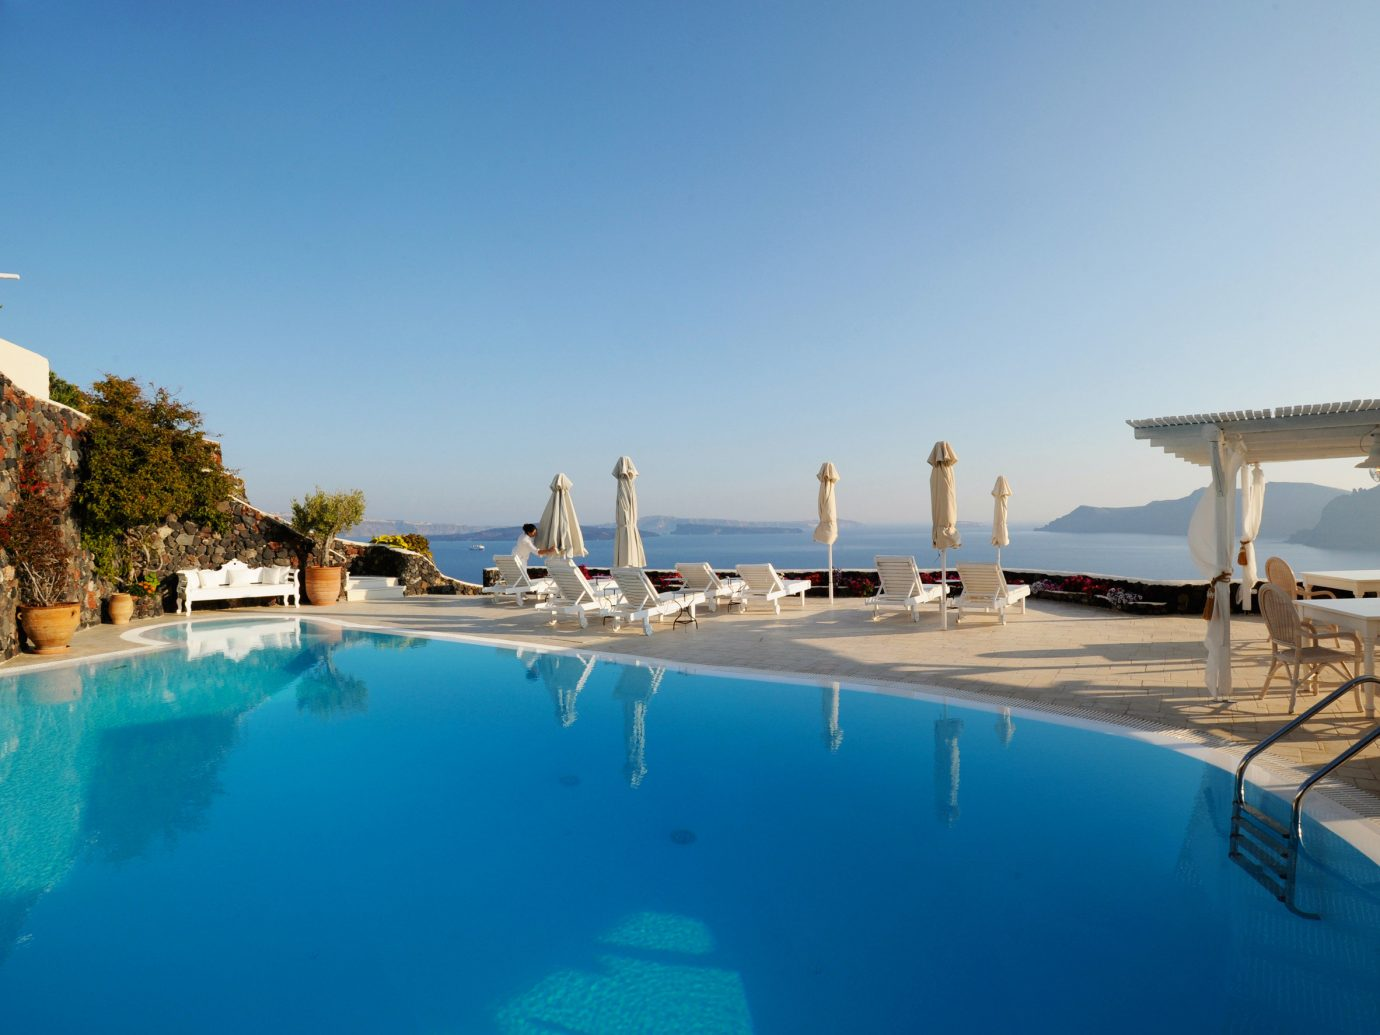 Hotels sky swimming pool property leisure Resort vacation estate Villa blue Sea bay marina Pool